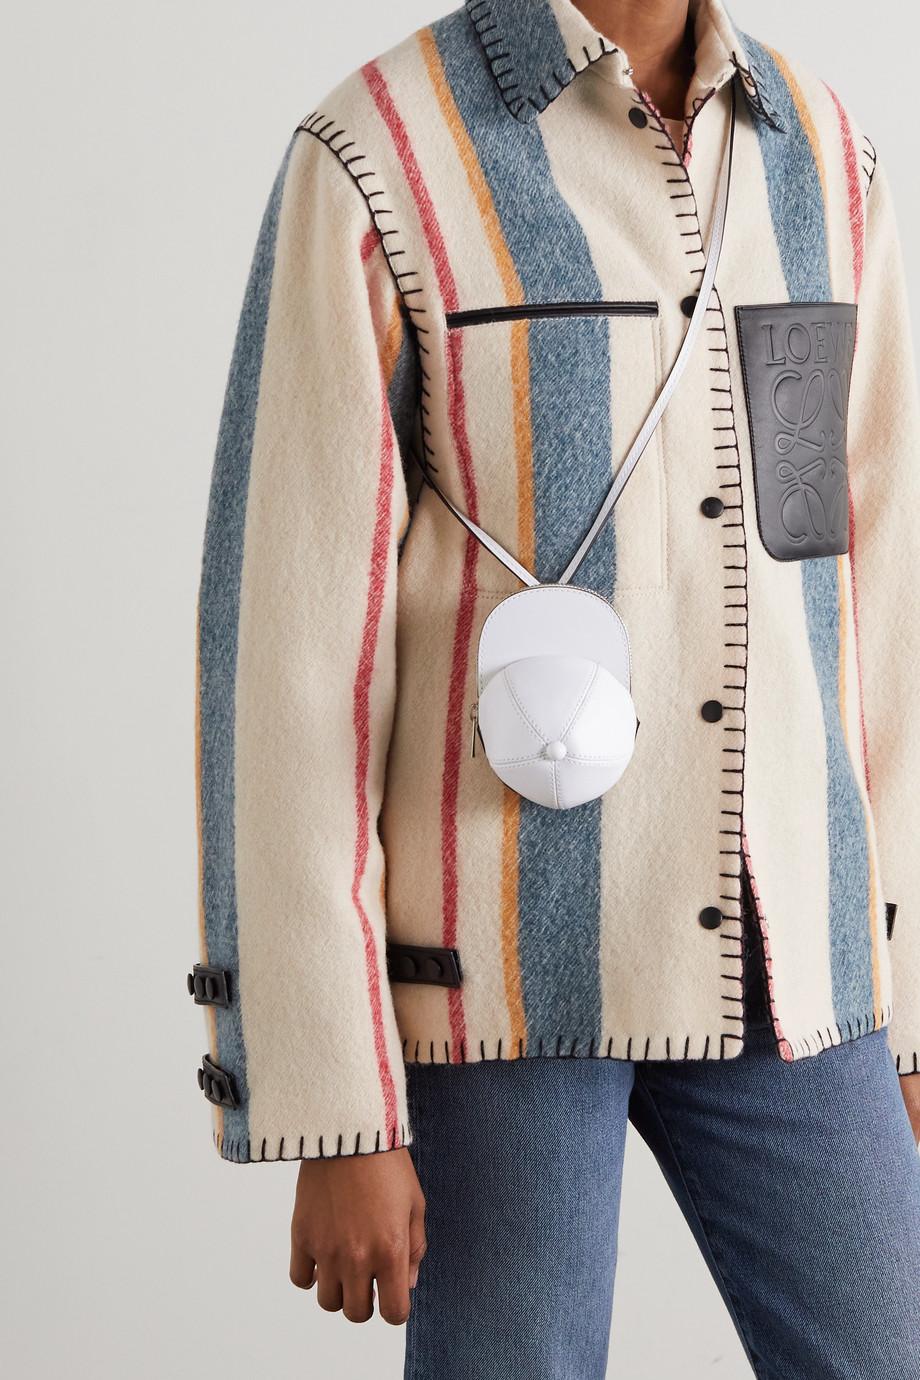 JW Anderson Nano Cap 皮革单肩包